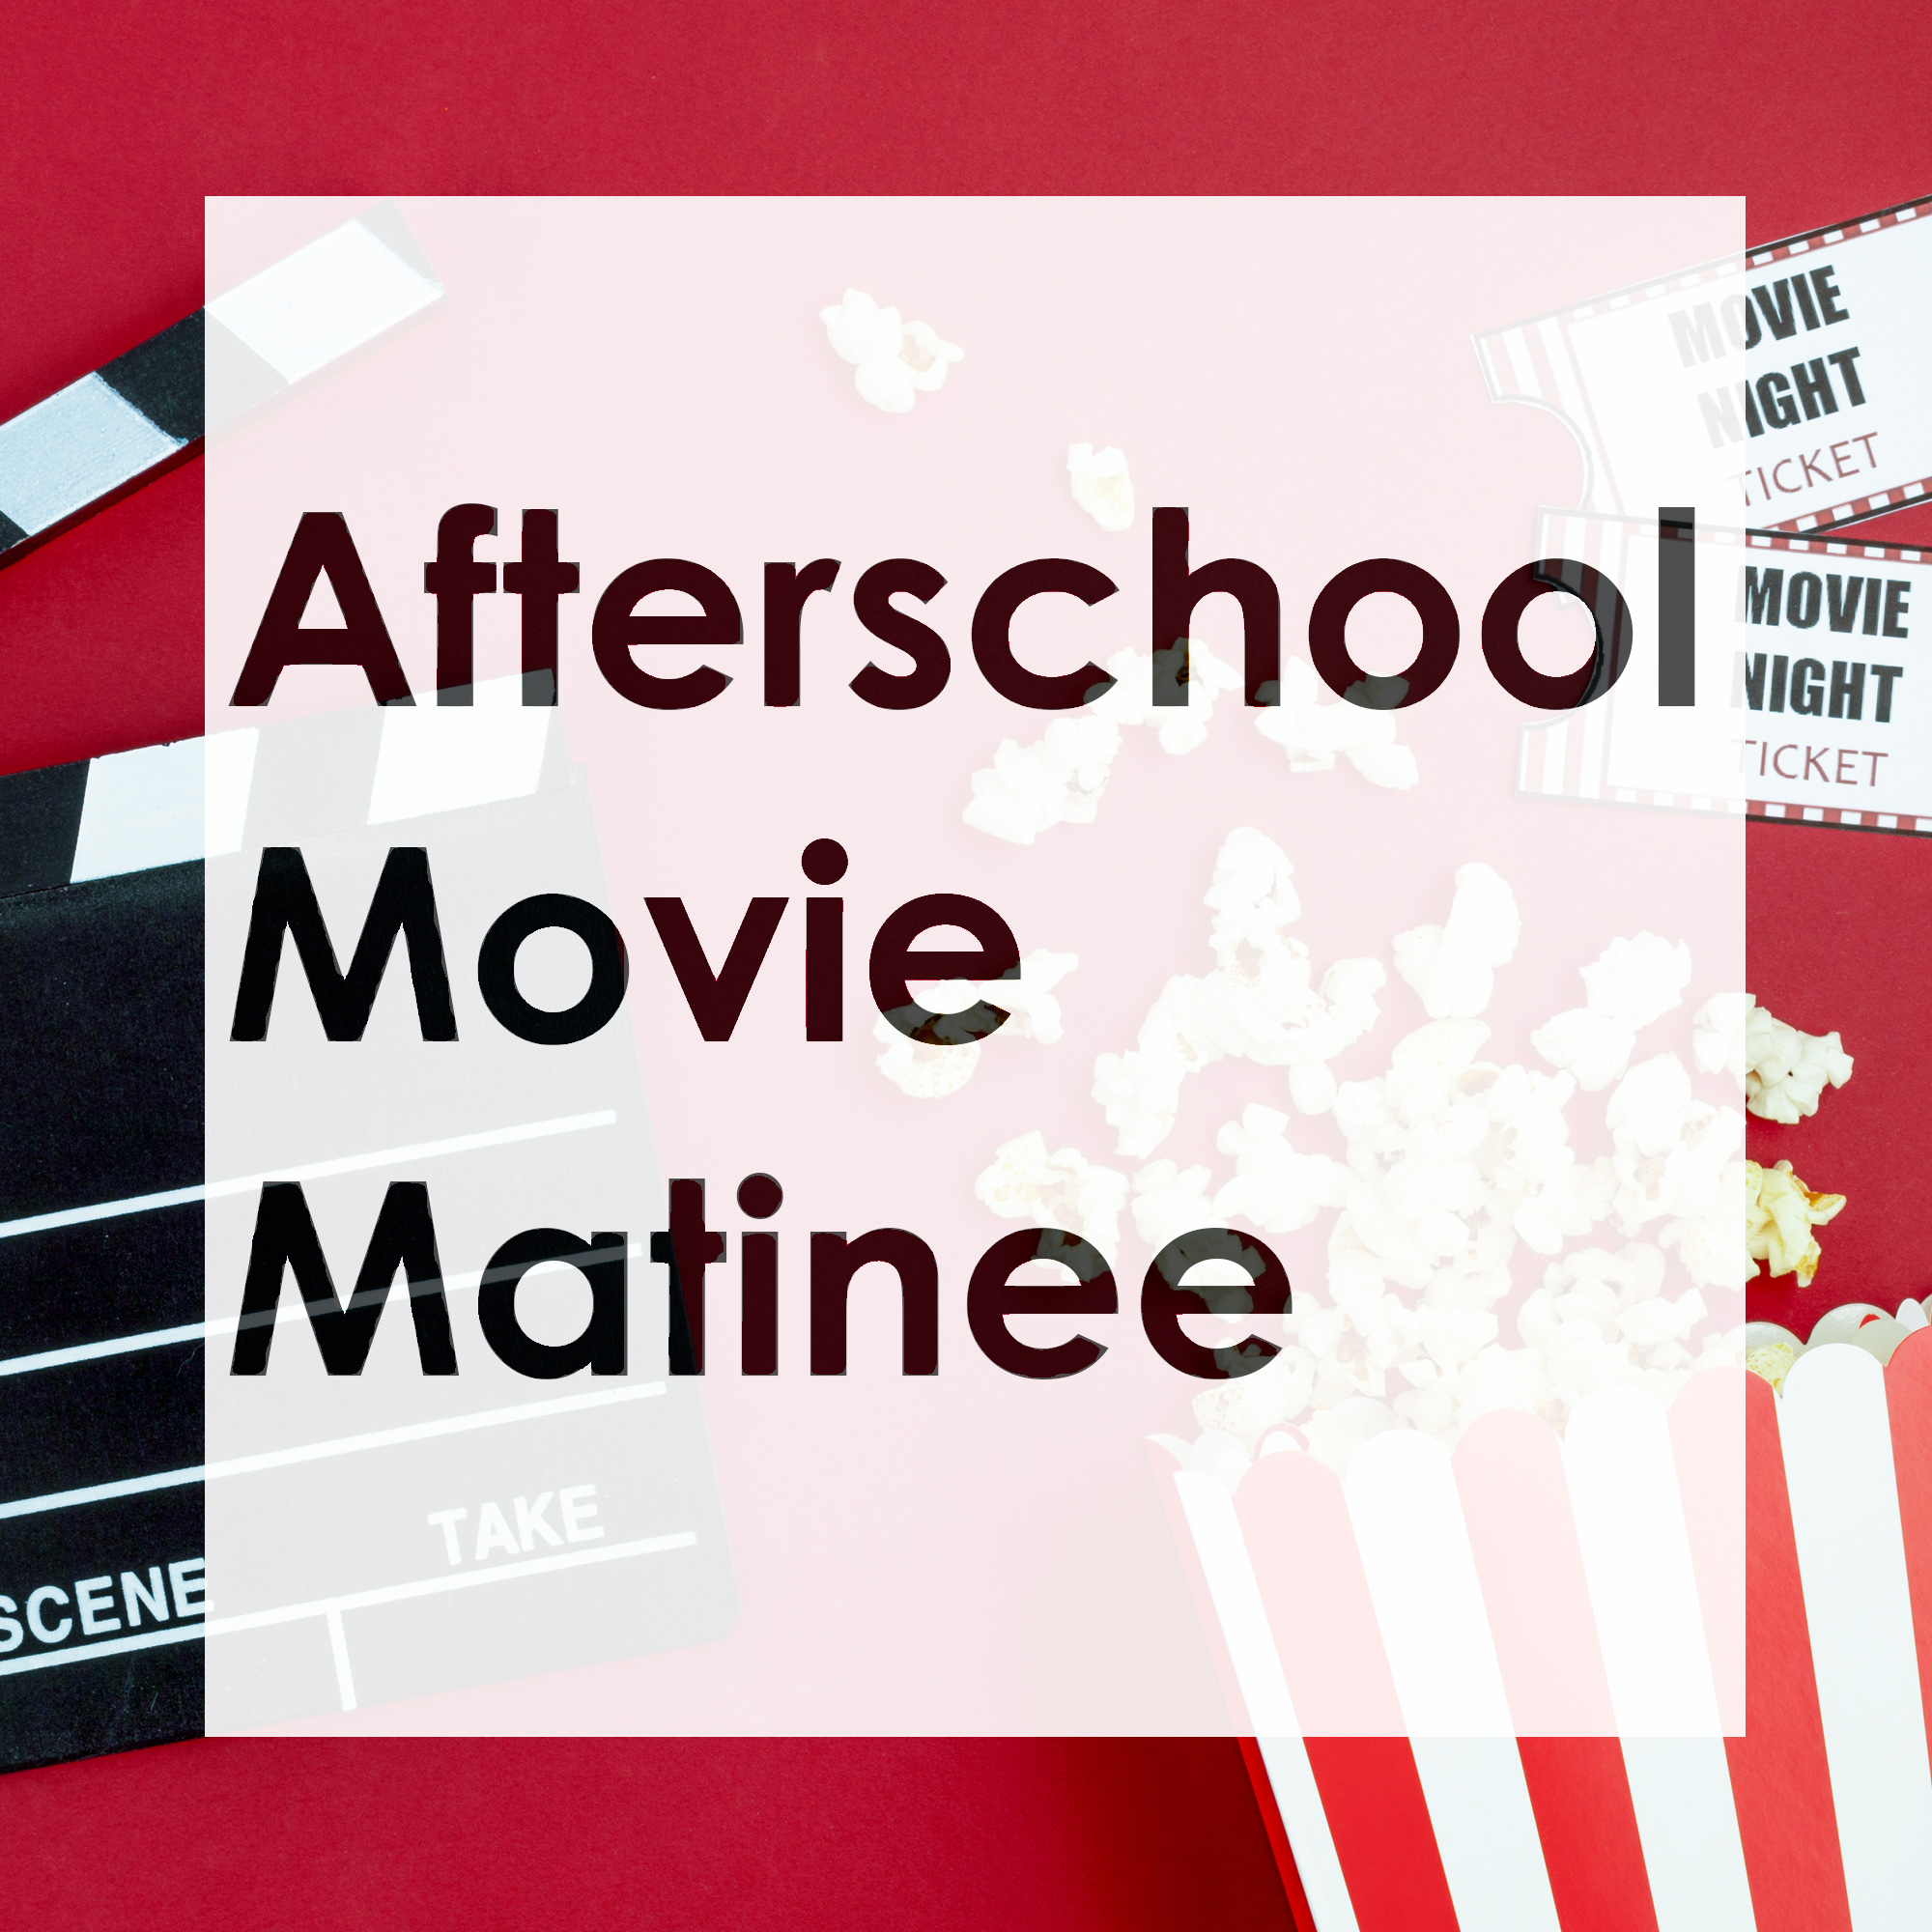 Afterschool Movie Matinee